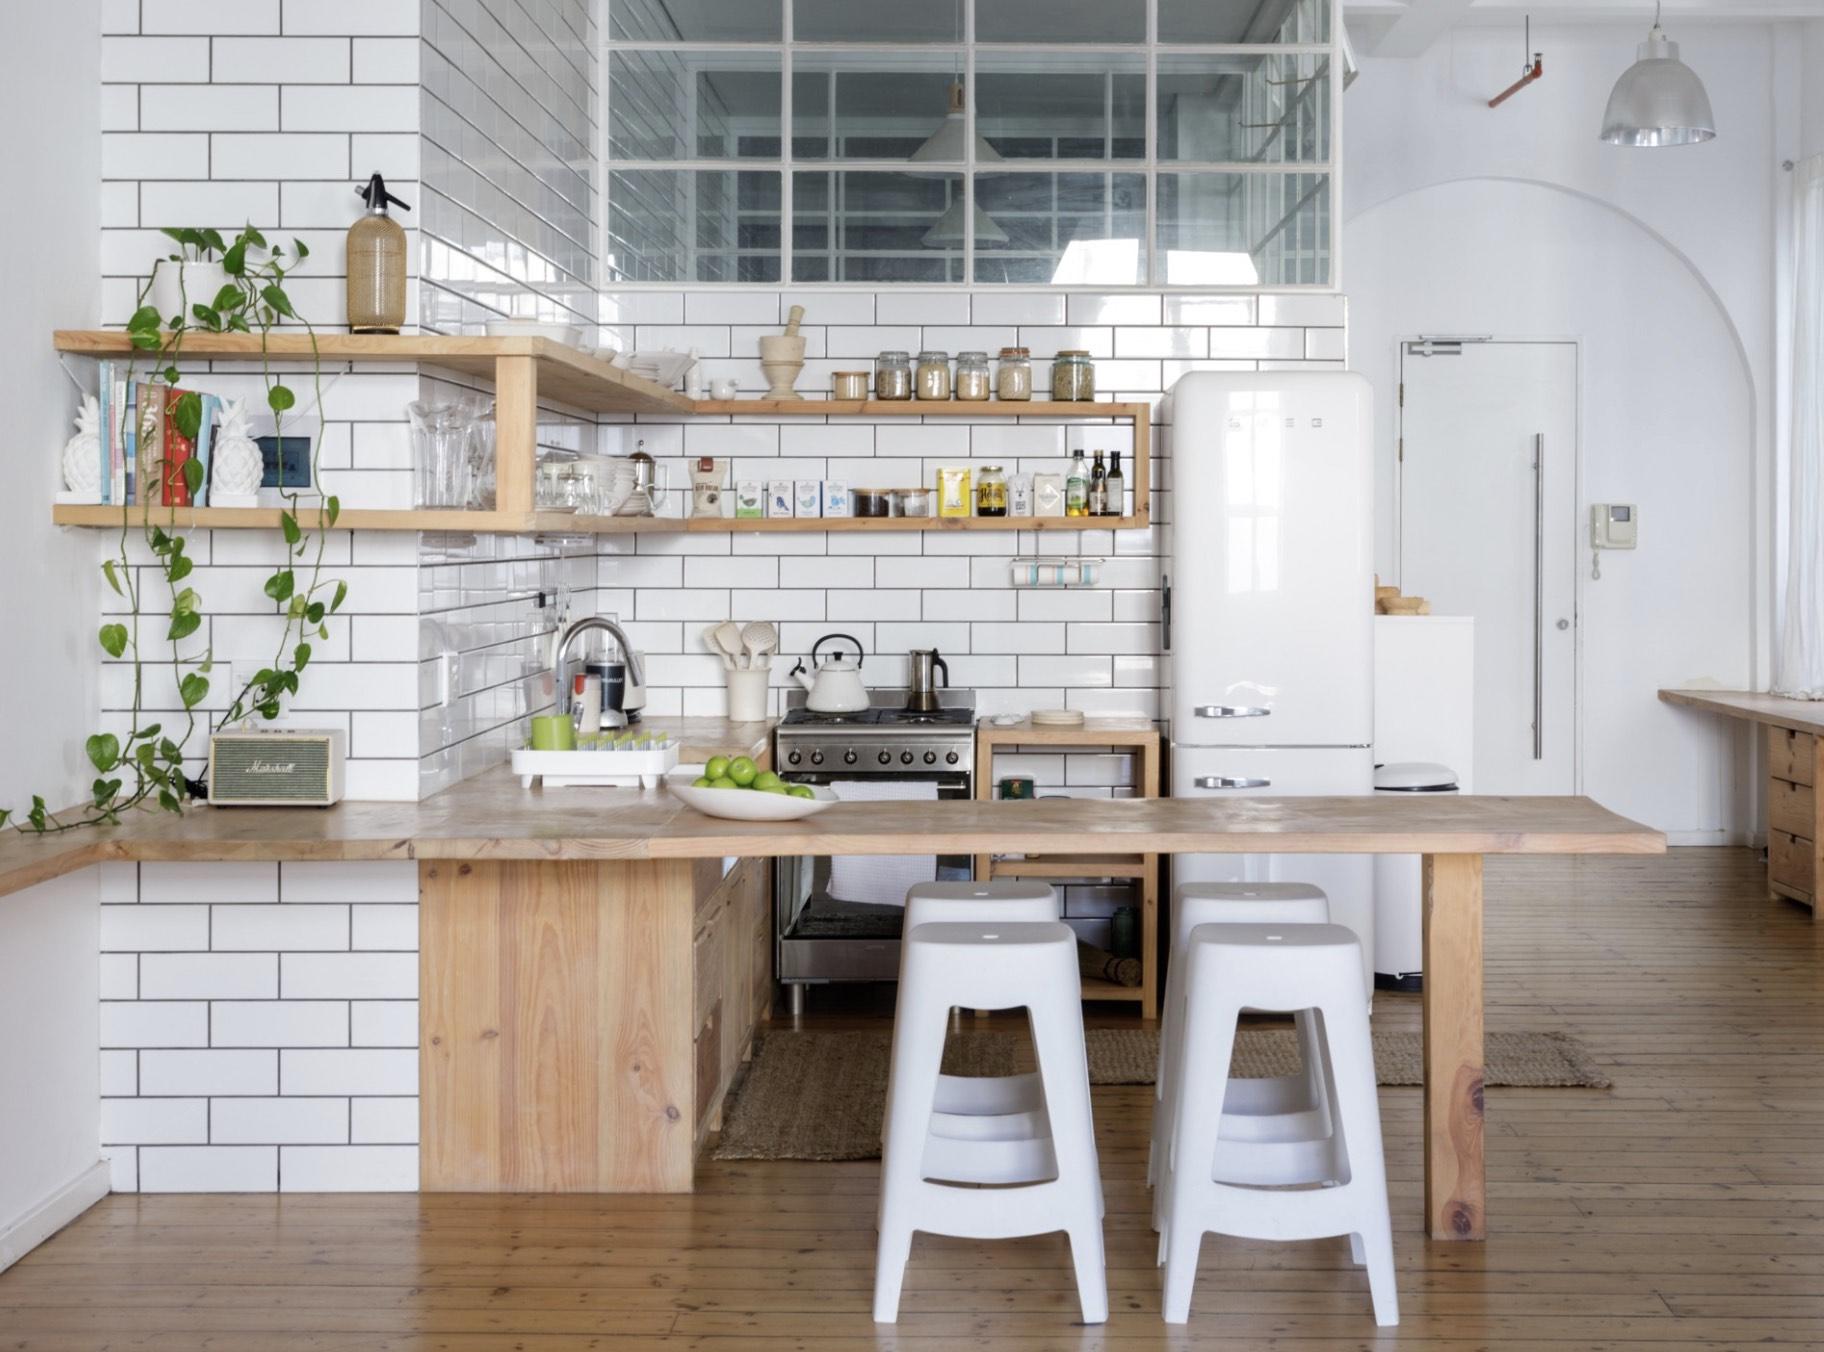 Cheap Airbnbs in Cape Town